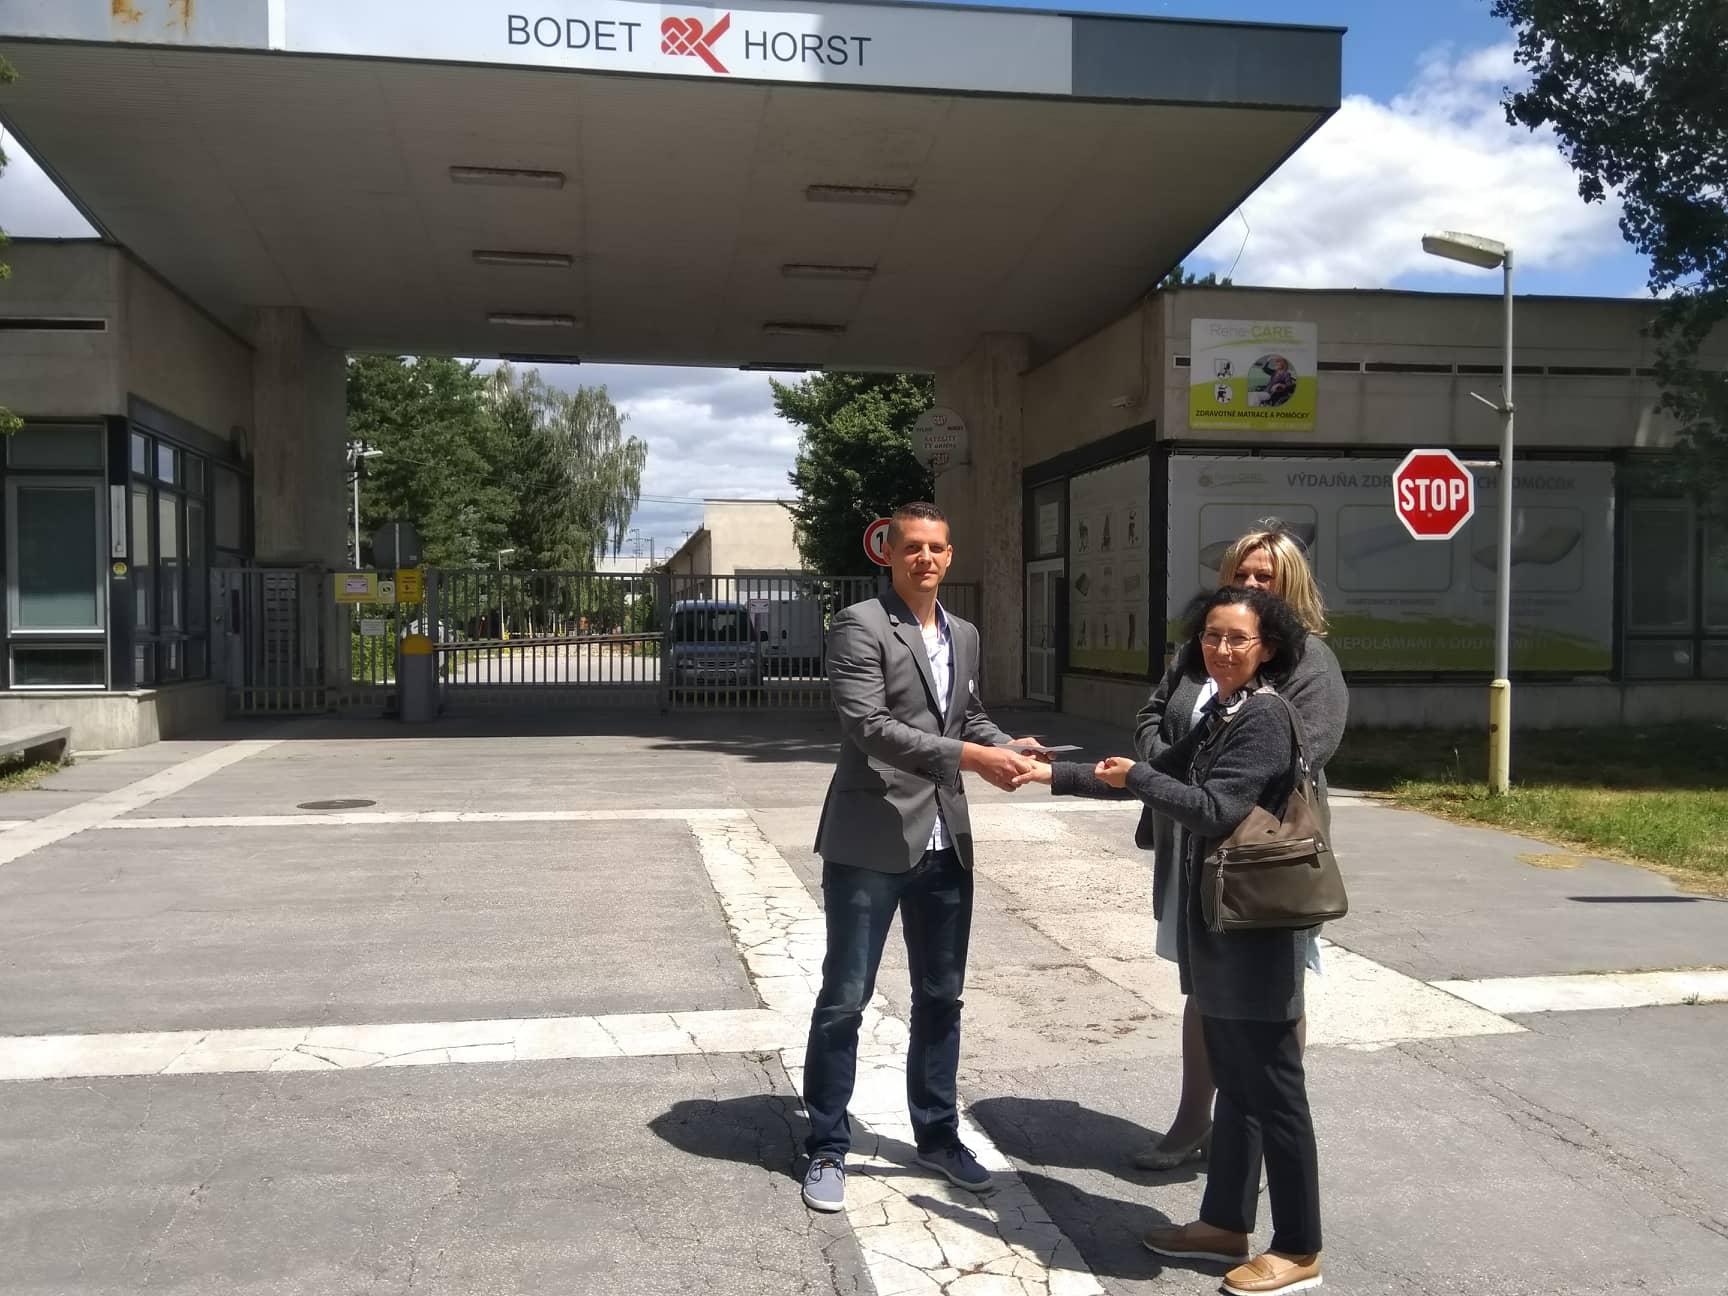 Vzdor-strana práce odovzdala zamestnancom fabriky Bodet & Horst vo Vrbovom výťažok zo zbierky na právnu pomoc, nakoľko fabrika je v konkurze